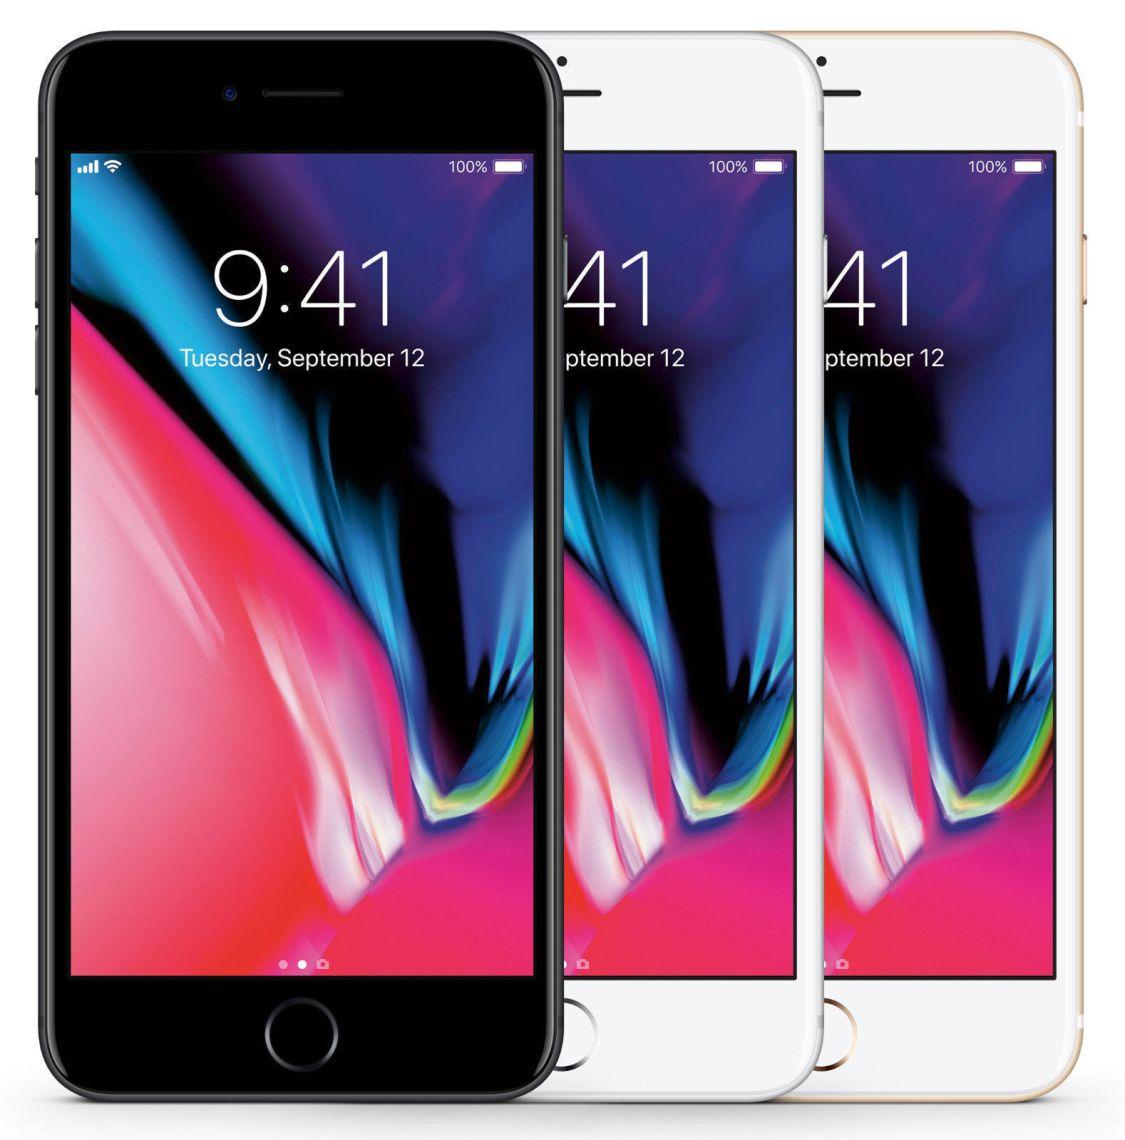 APPLE IPHONE 8 64GB SPACEGRAU GOLD ROT SIMLOCKFREI WOW TOP SMARTPHONE NEU